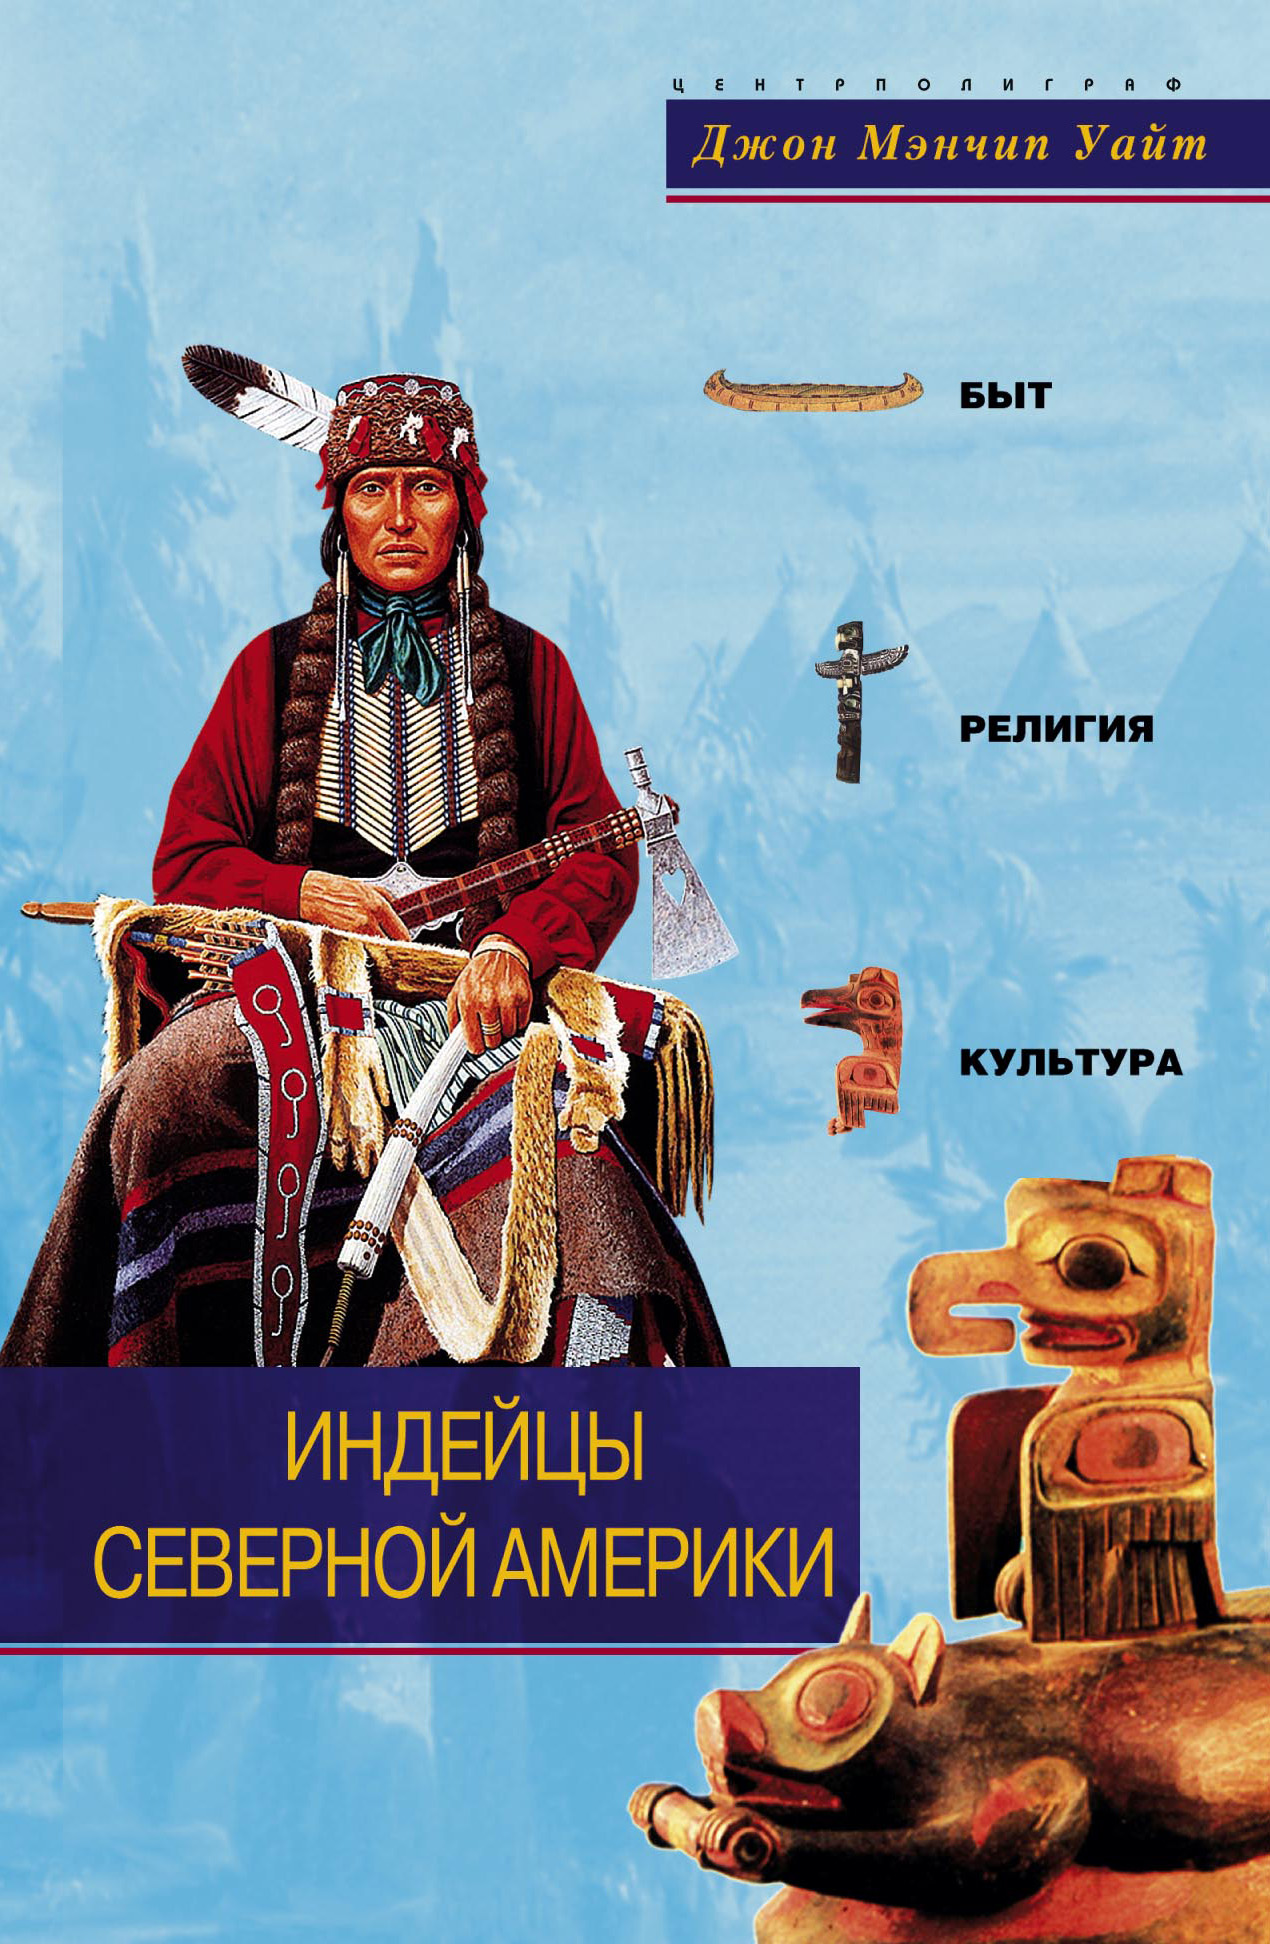 Джон Мэнчип Уайт Индейцы Северной Америки. Быт, религия, культура луи боден инки быт культура религия